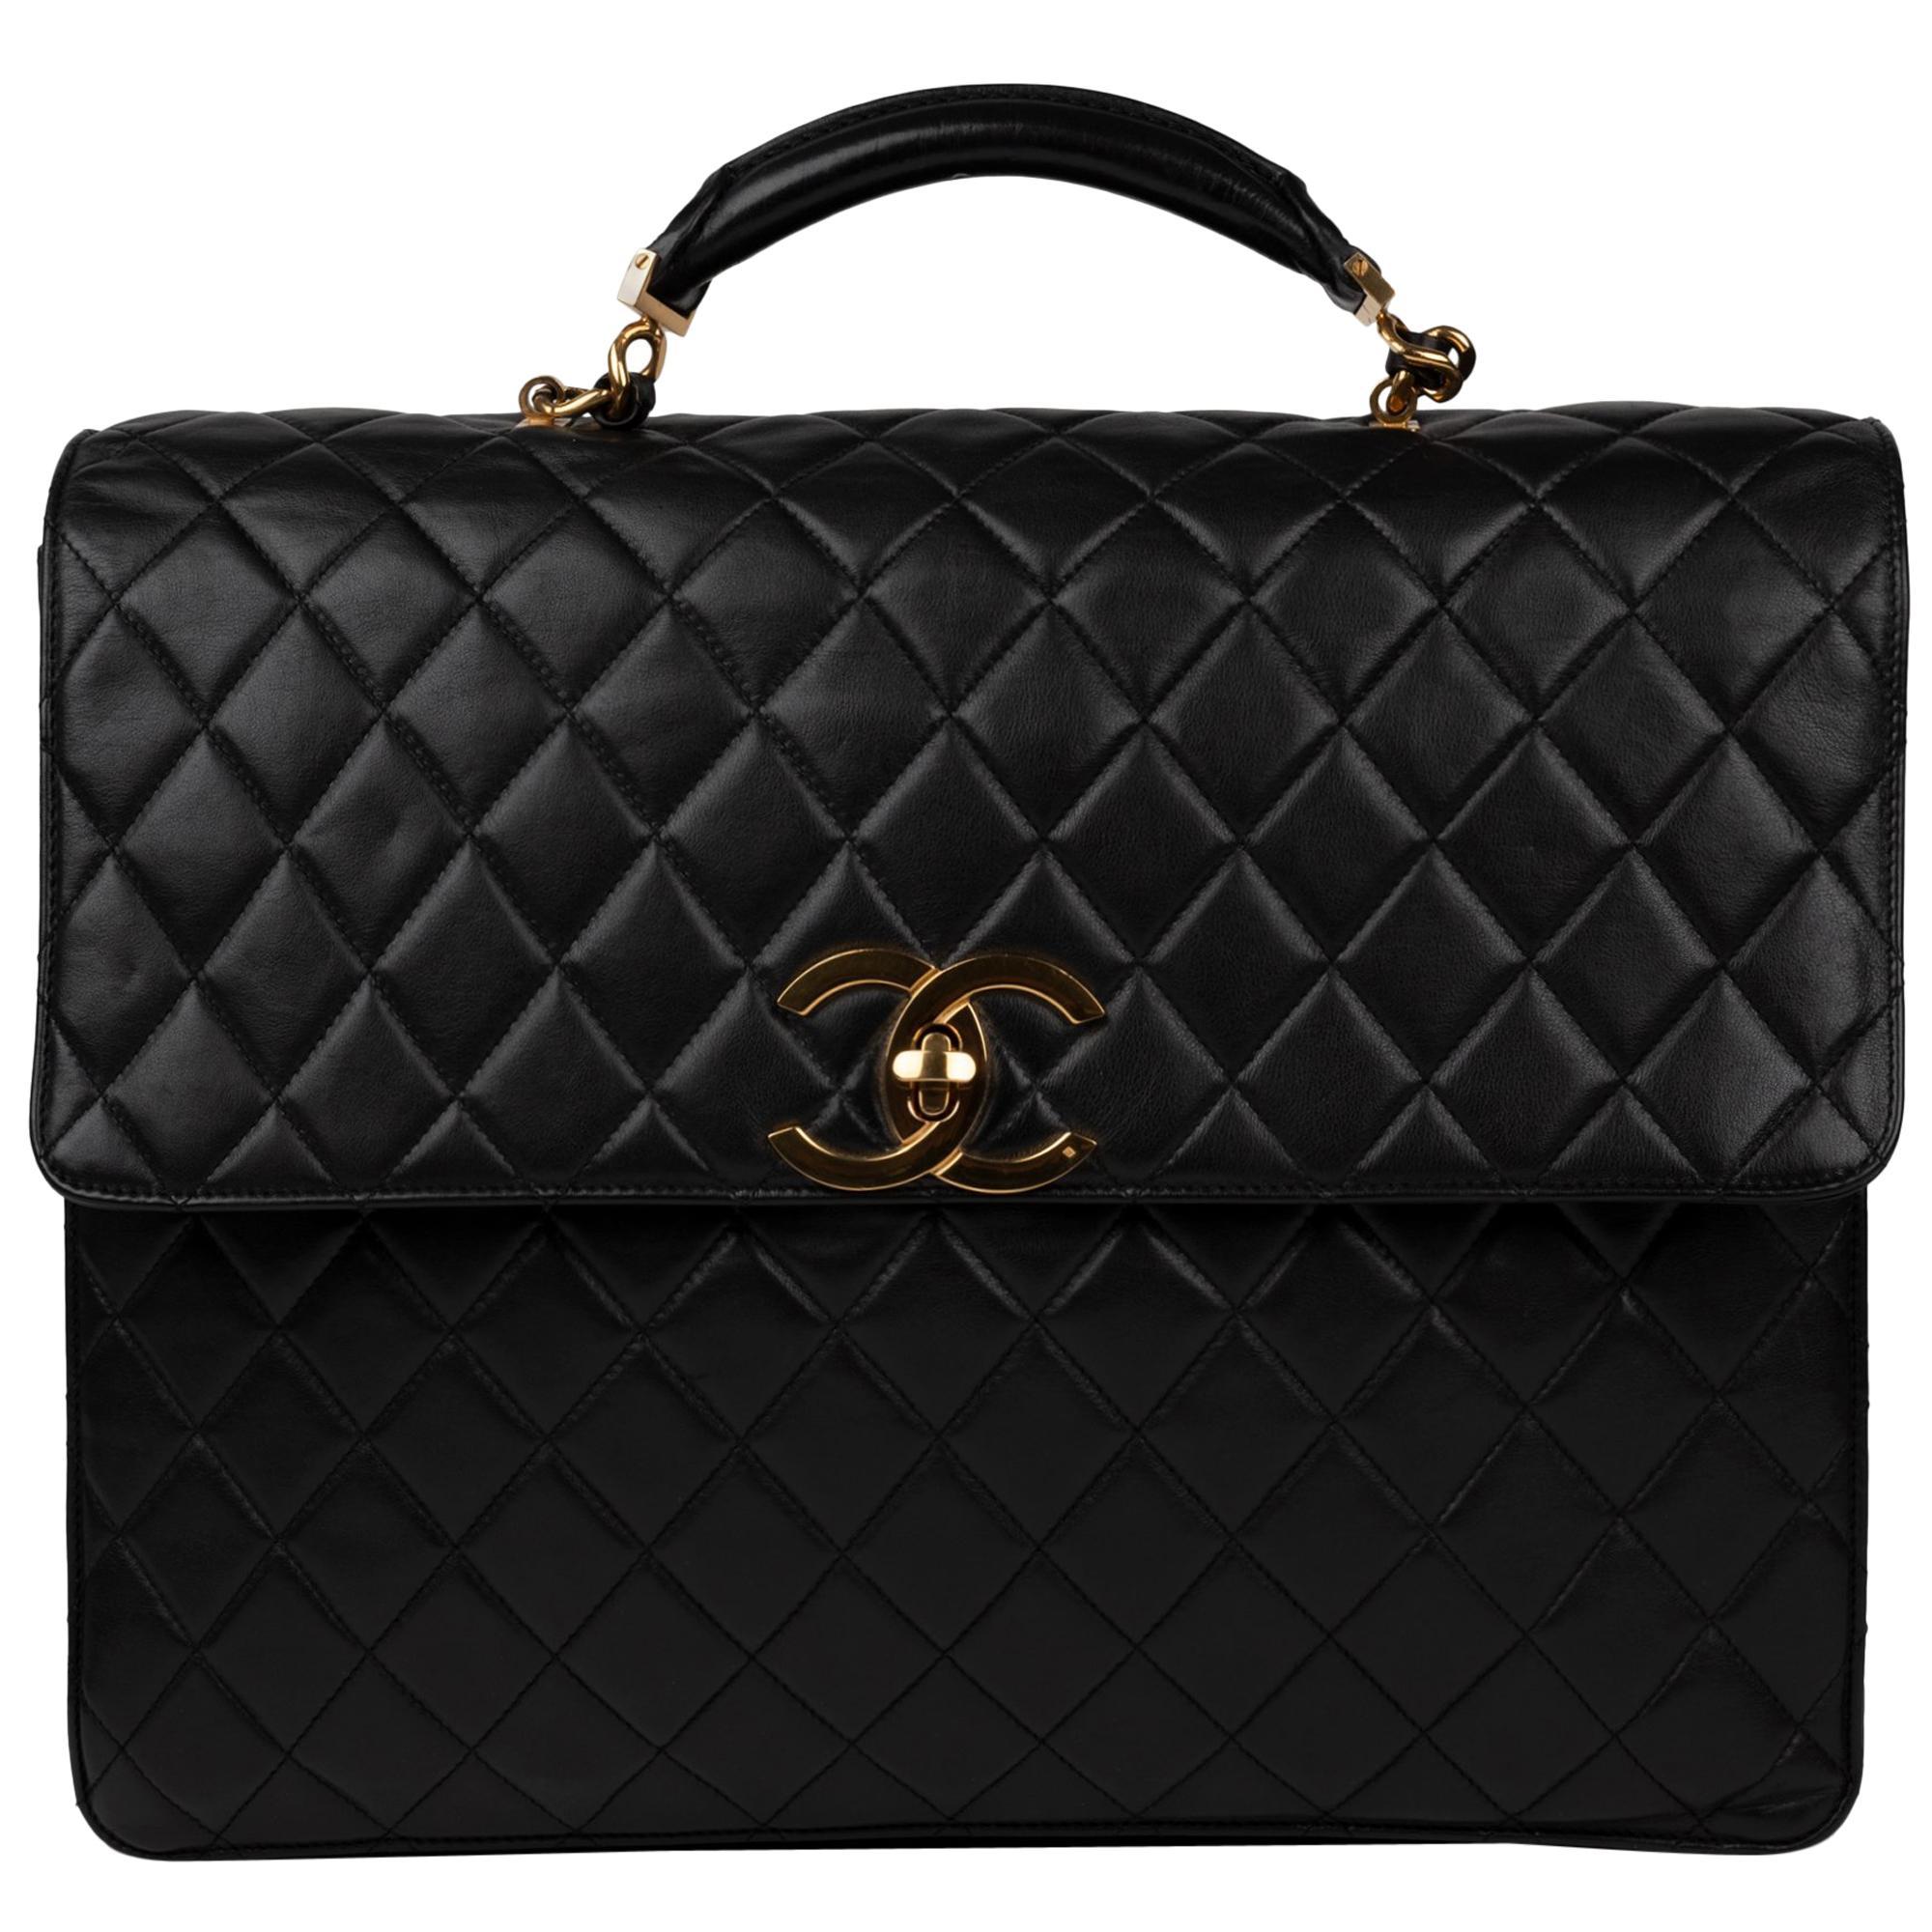 9b53f4eb48da Vintage Chanel Purses and Handbags at 1stdibs